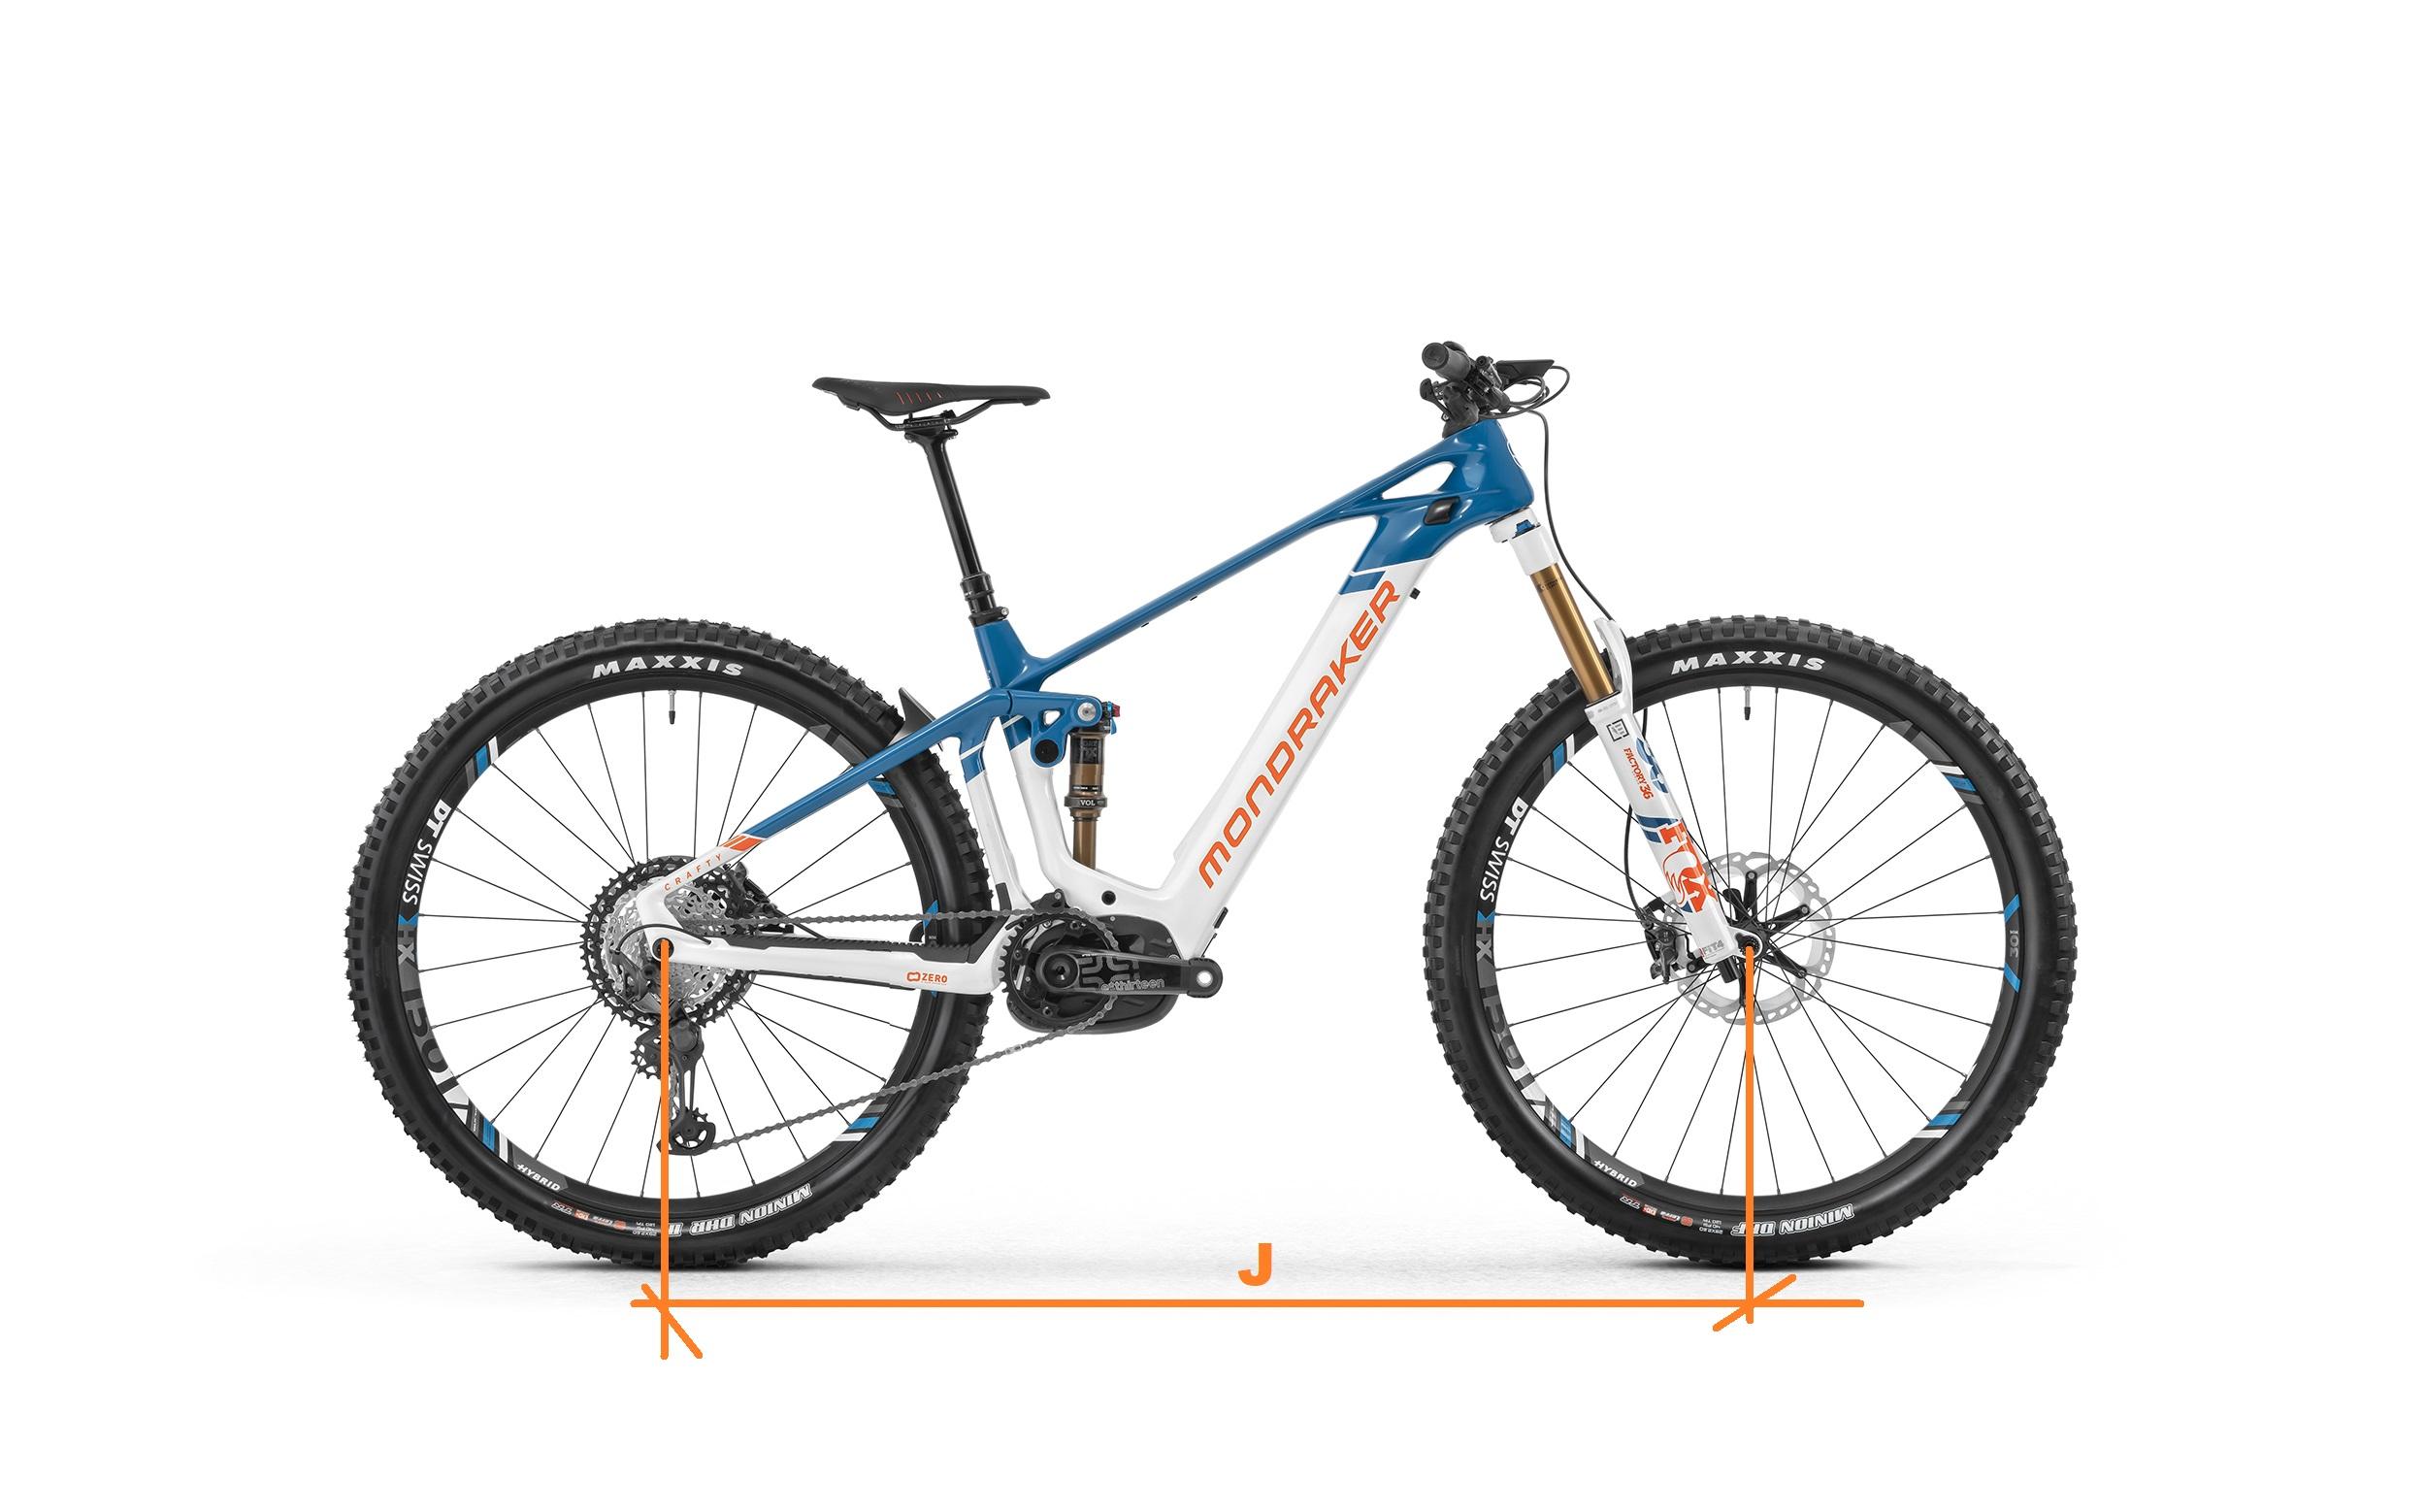 interasse bici elettrica Mondraker crafty carbon RR